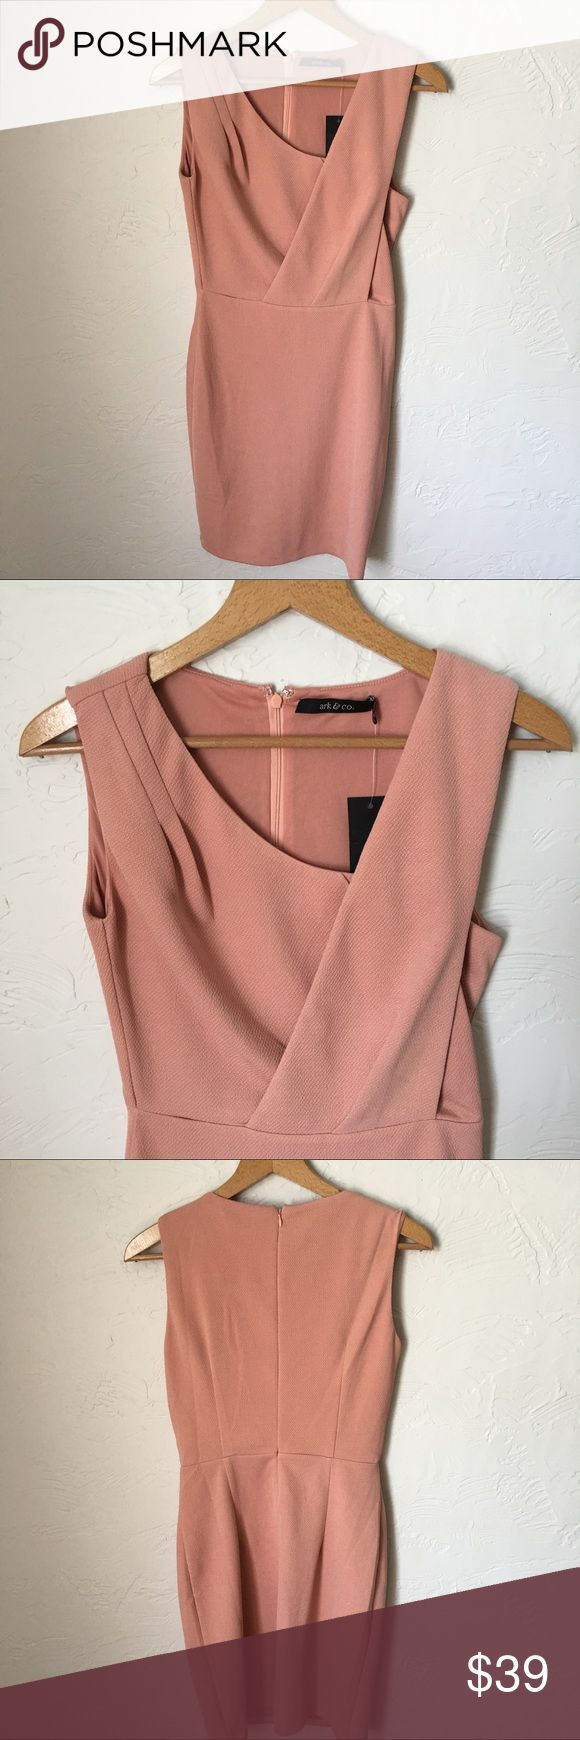 "Ark & co. NWT salmon dress Ark & co. NWT salmon colored sleeveless dress. 17"" bust measurement when laid flat. 35"" long. Ark & Co Dresses"